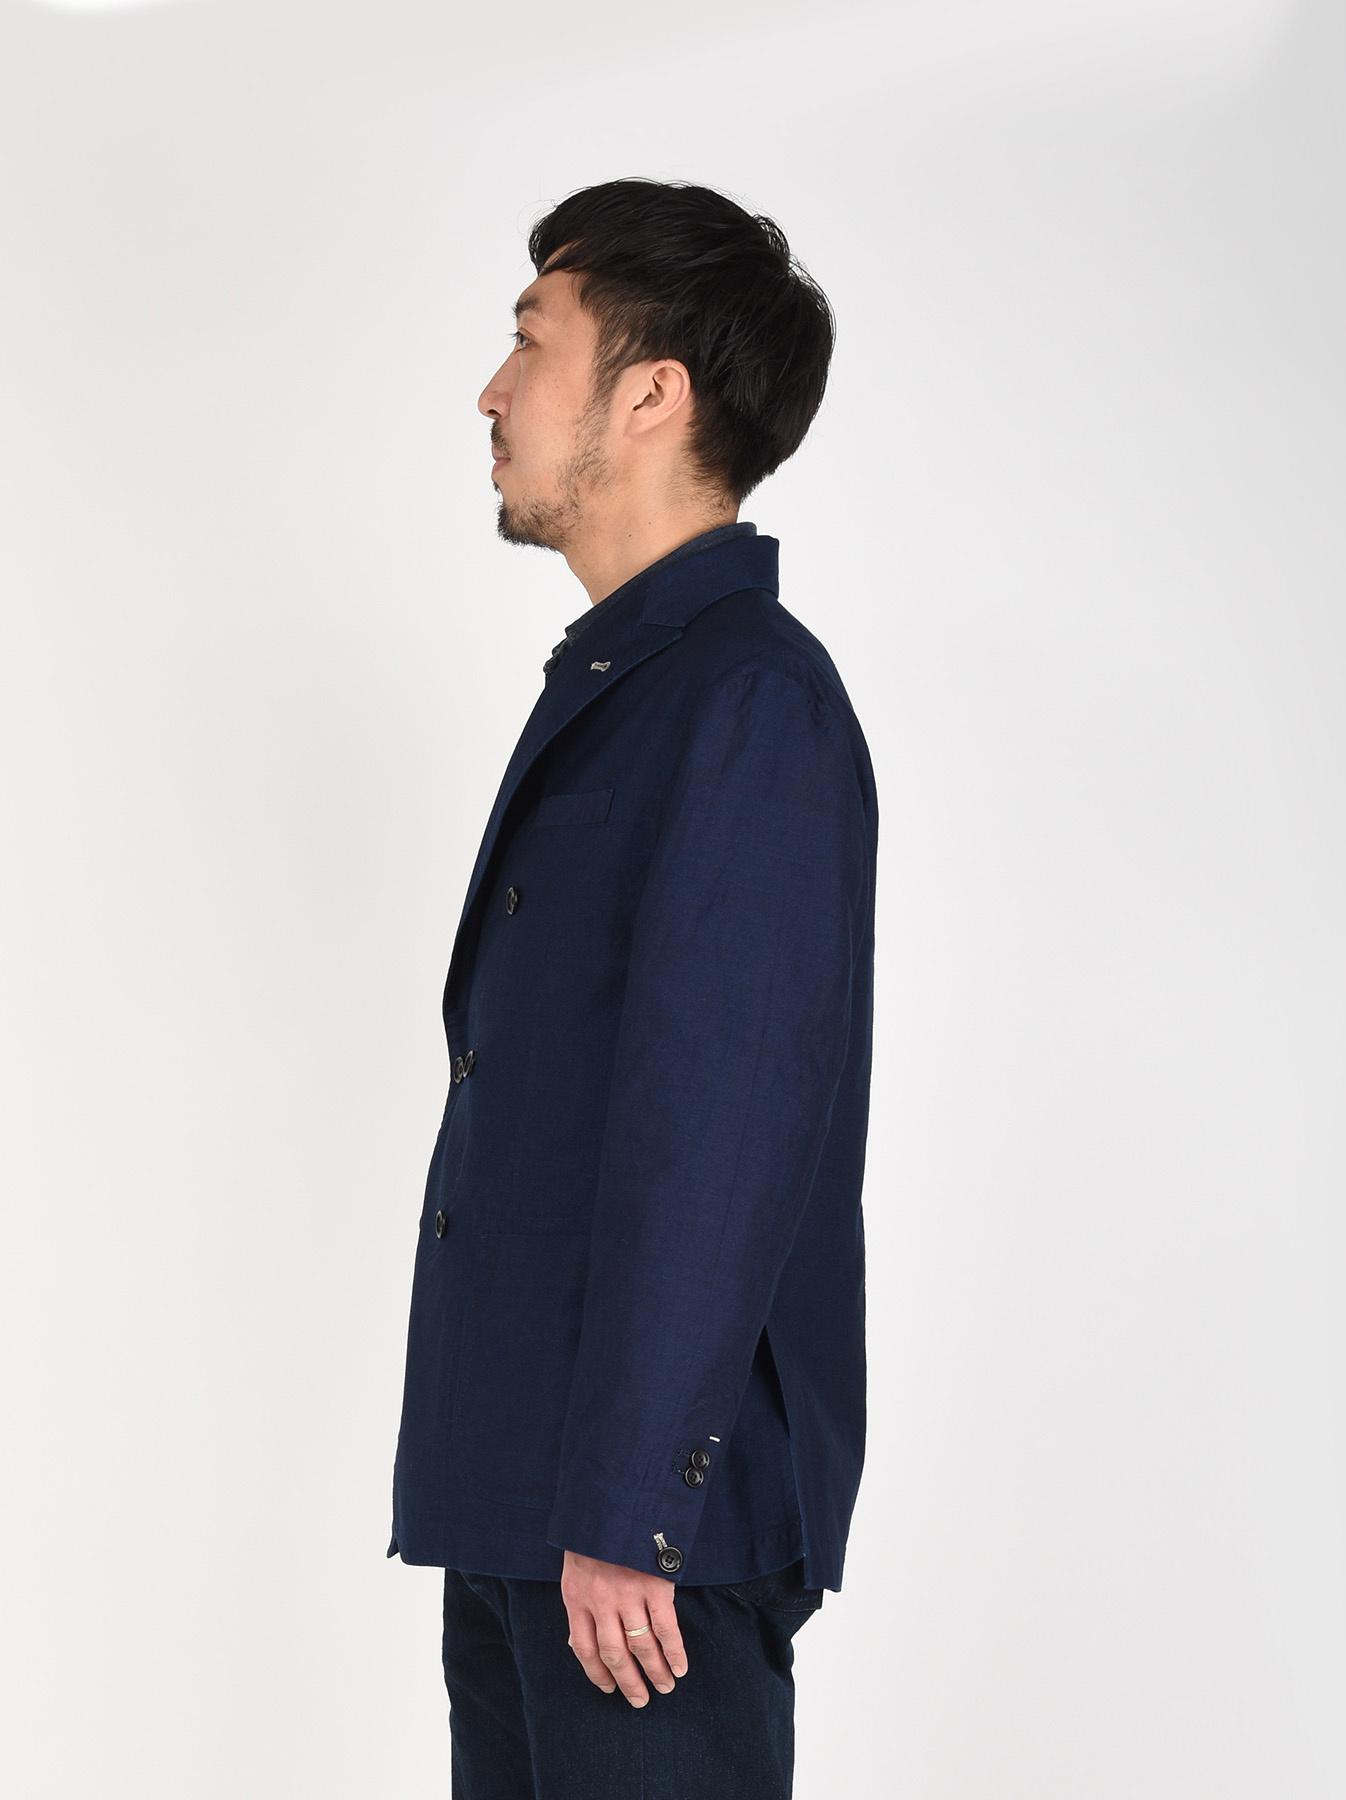 Indigo Mugi Yoko-shusi Soroe Double Breasted Jacket-4